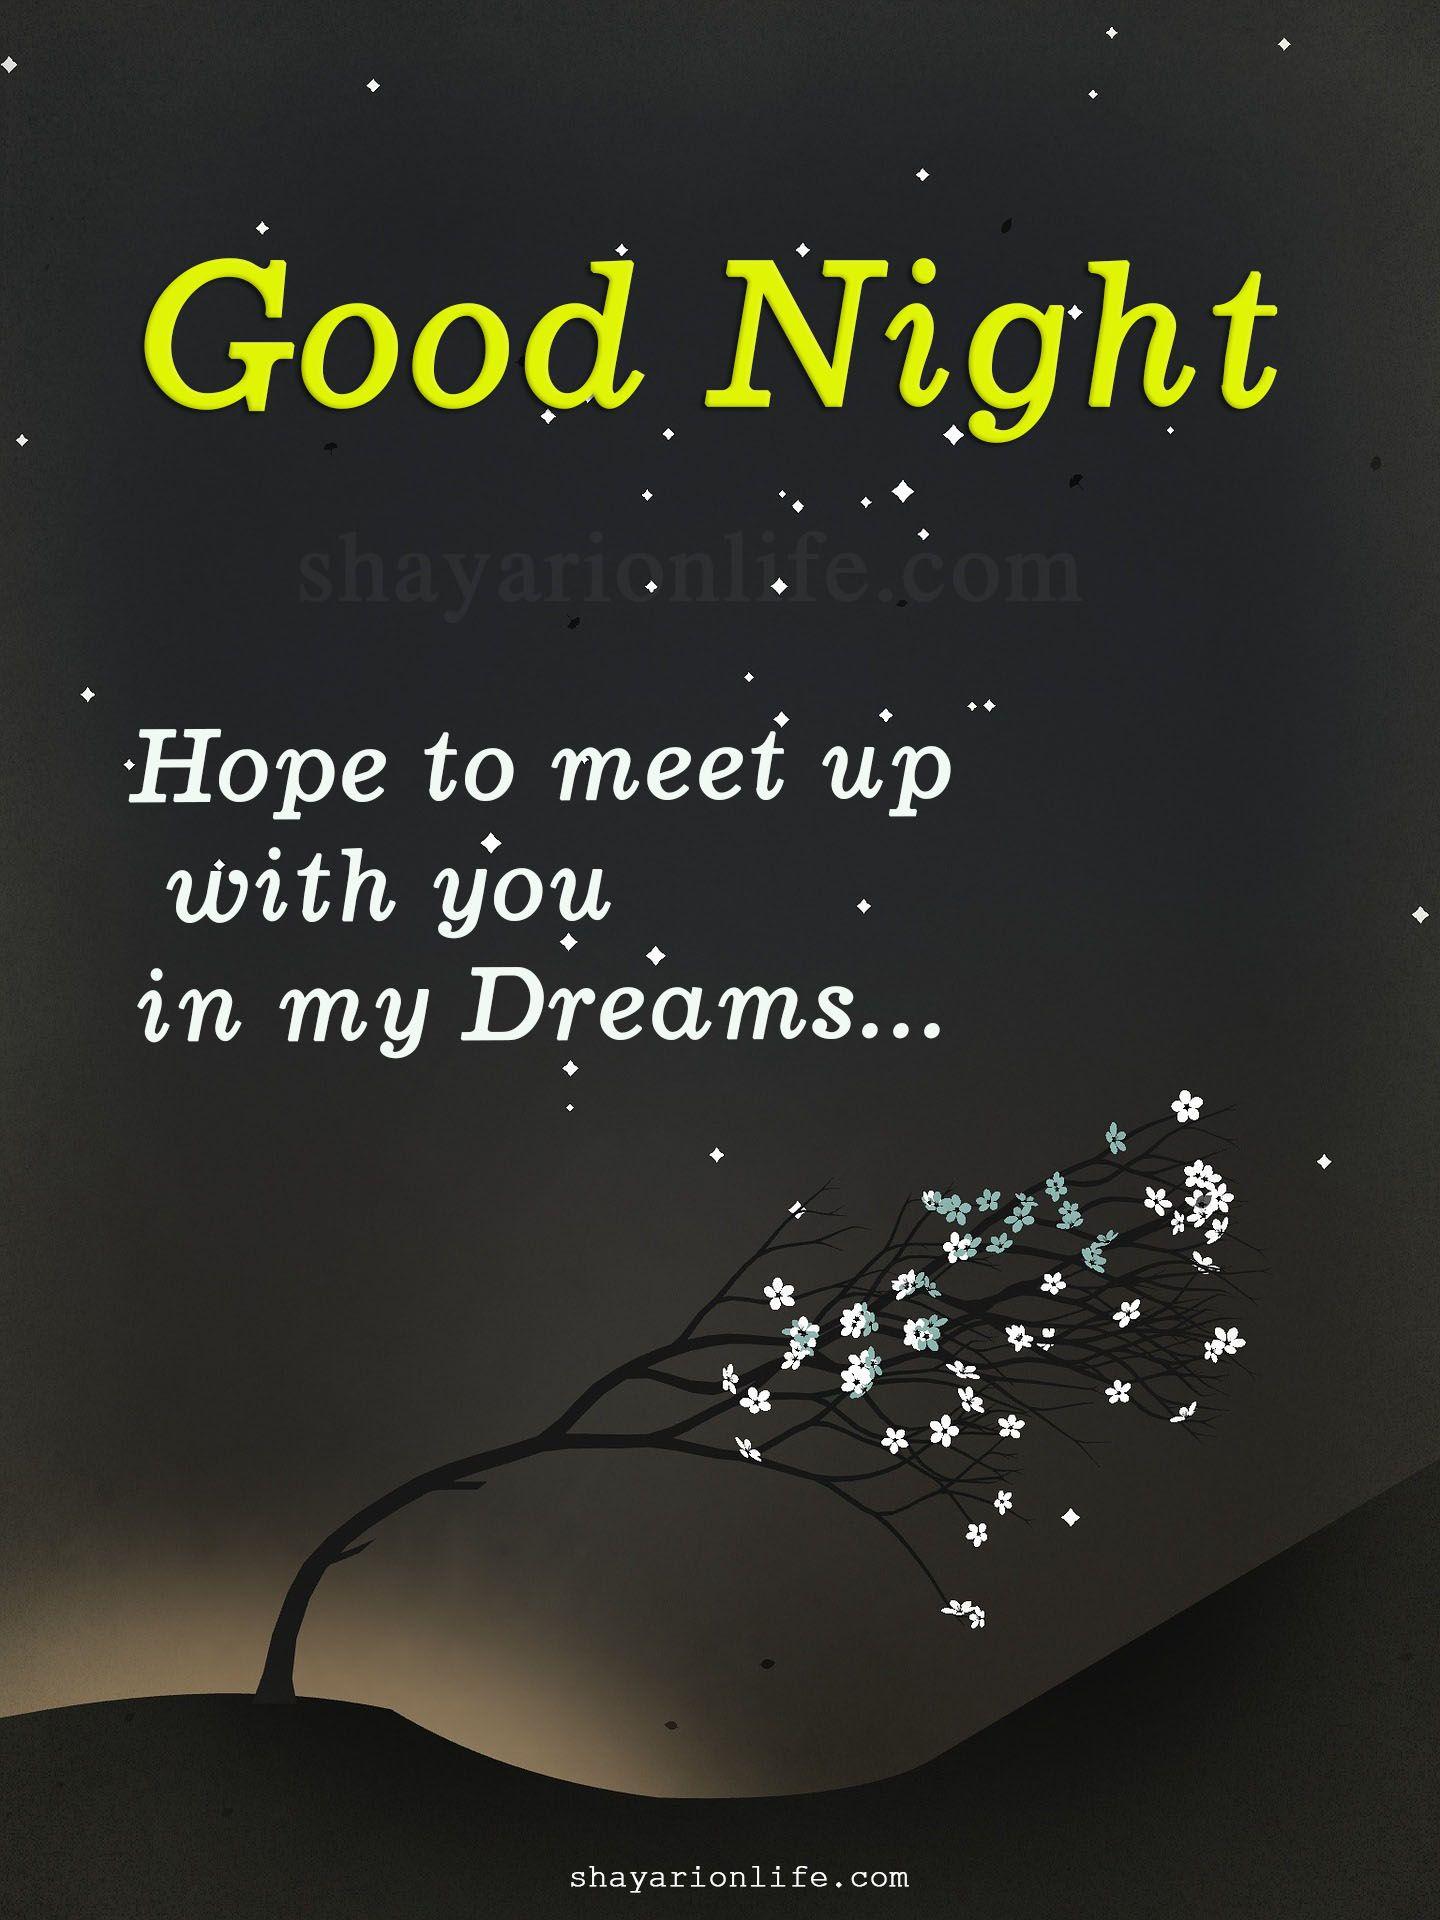 Good Night Good Night Wishes Good Night Night Wishes